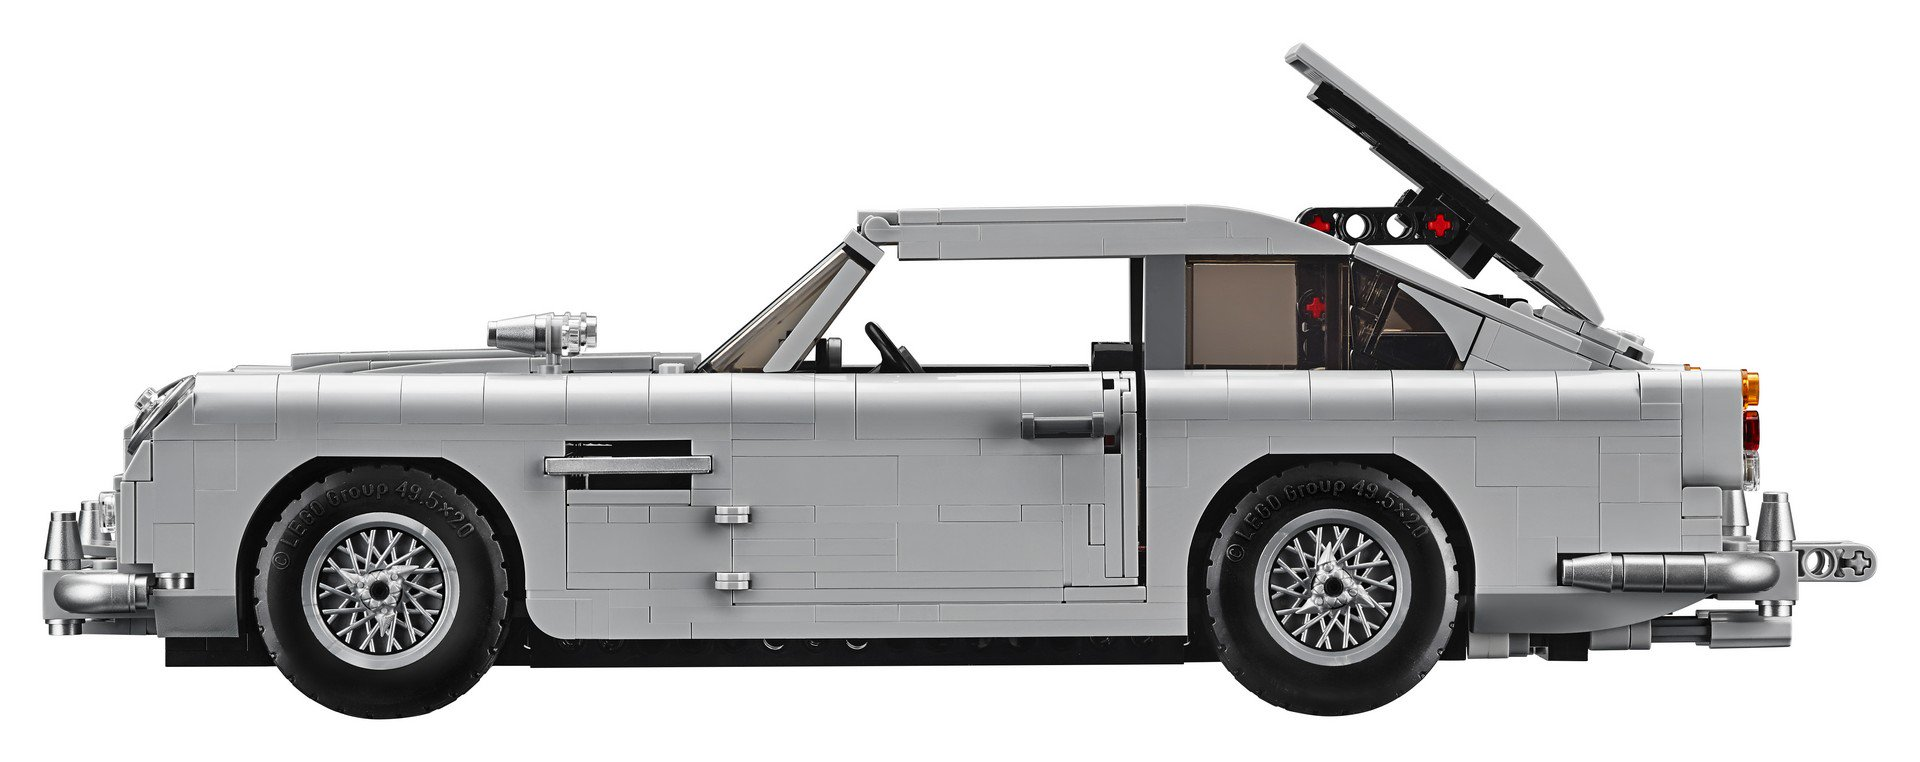 Lego Aston Martin DB5 (81)